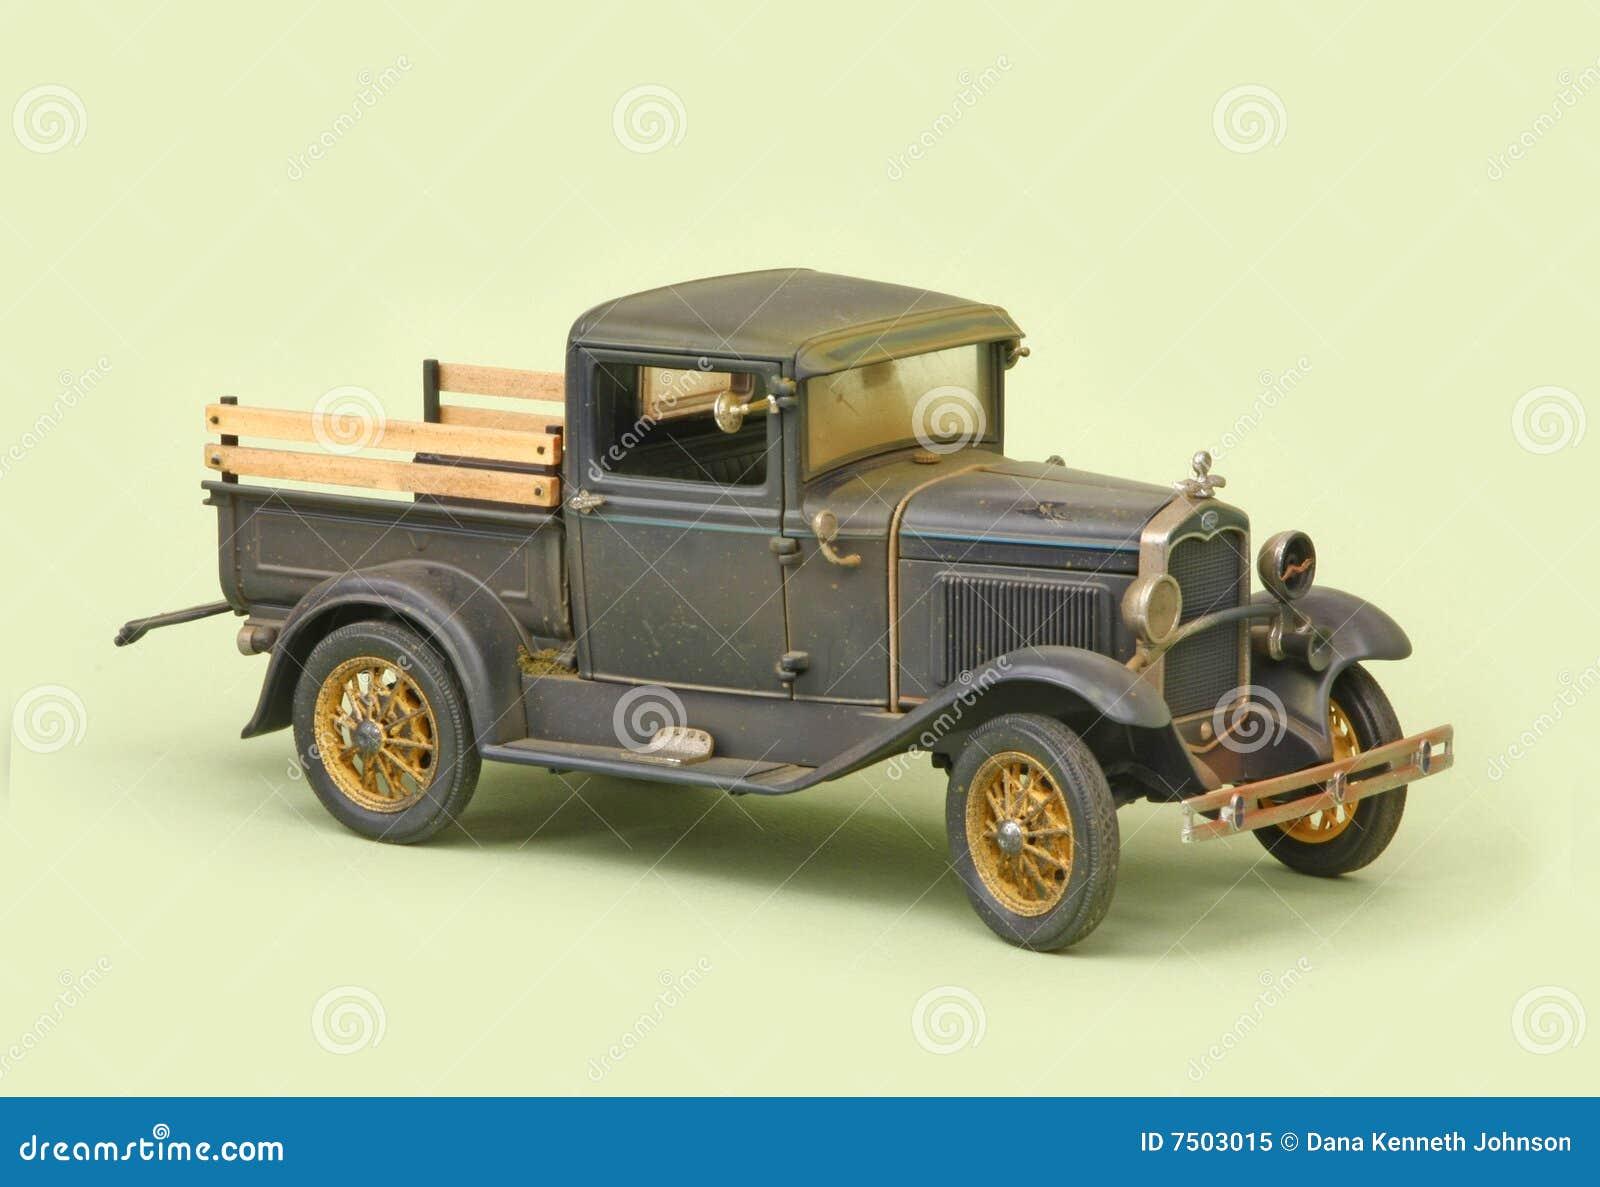 Ford 1931 Junkyard Pickup stock image. Image of classic - 7503015